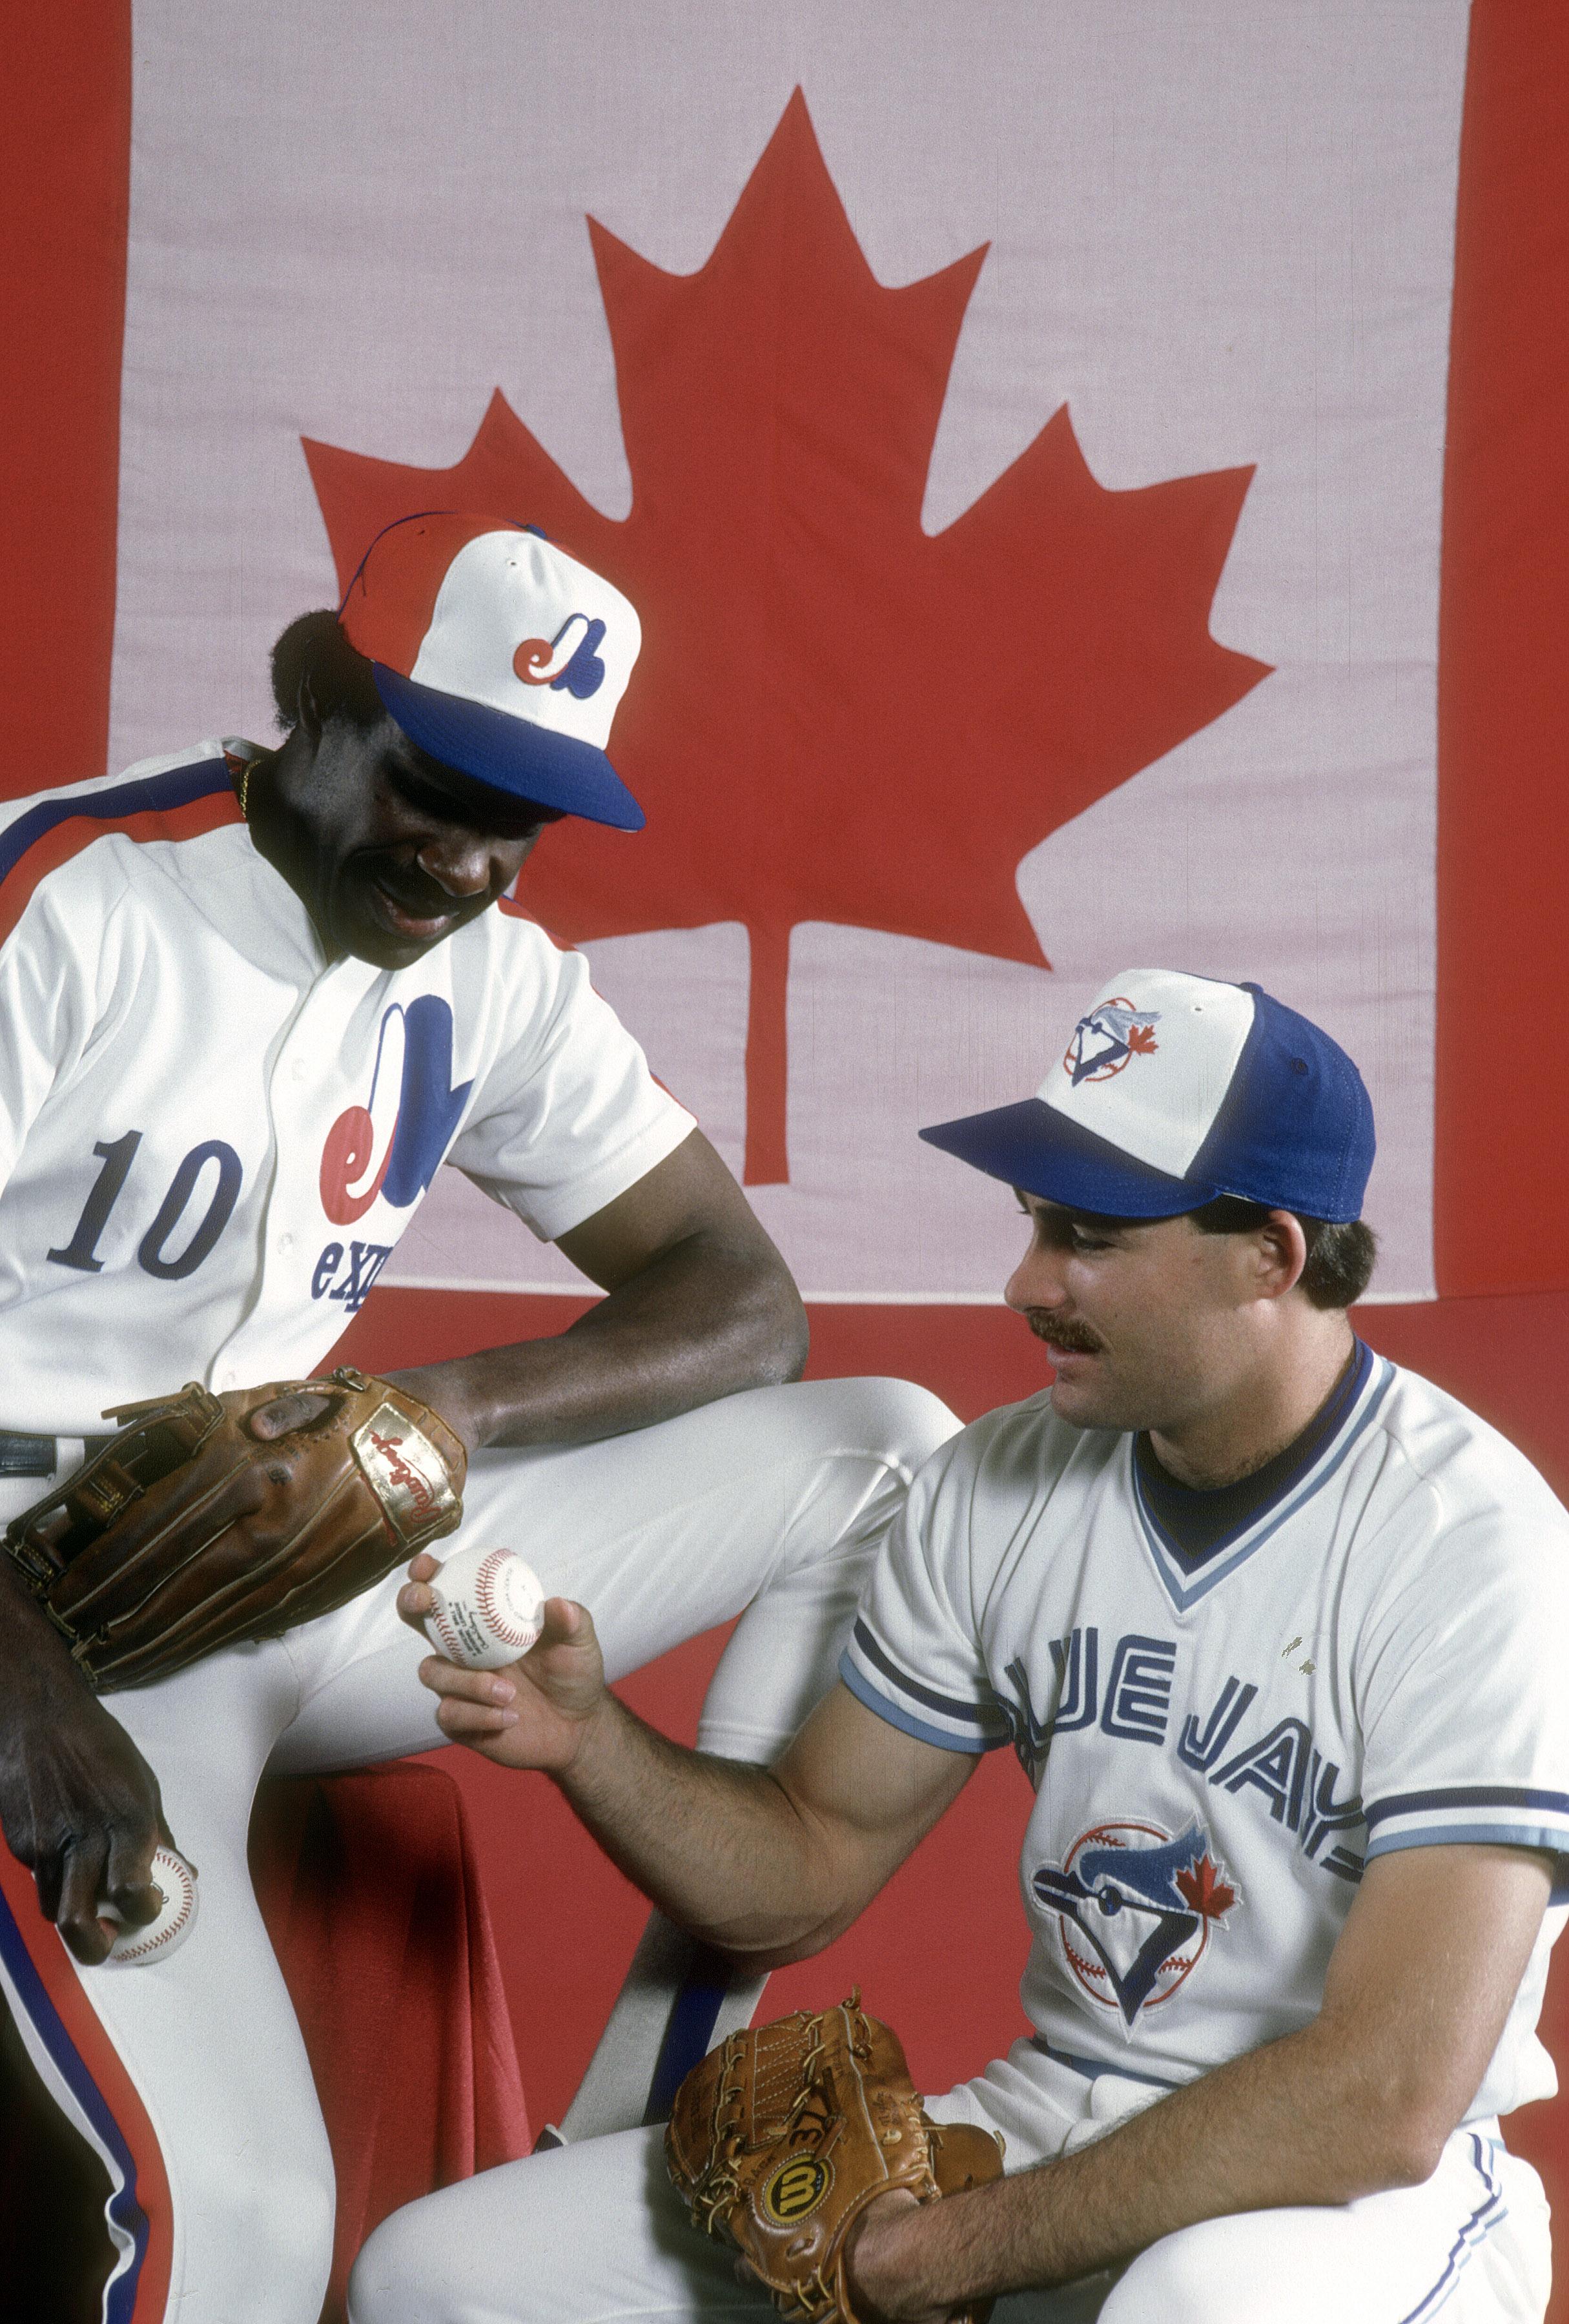 Toronto Blue Jays History - Bluebird Banter